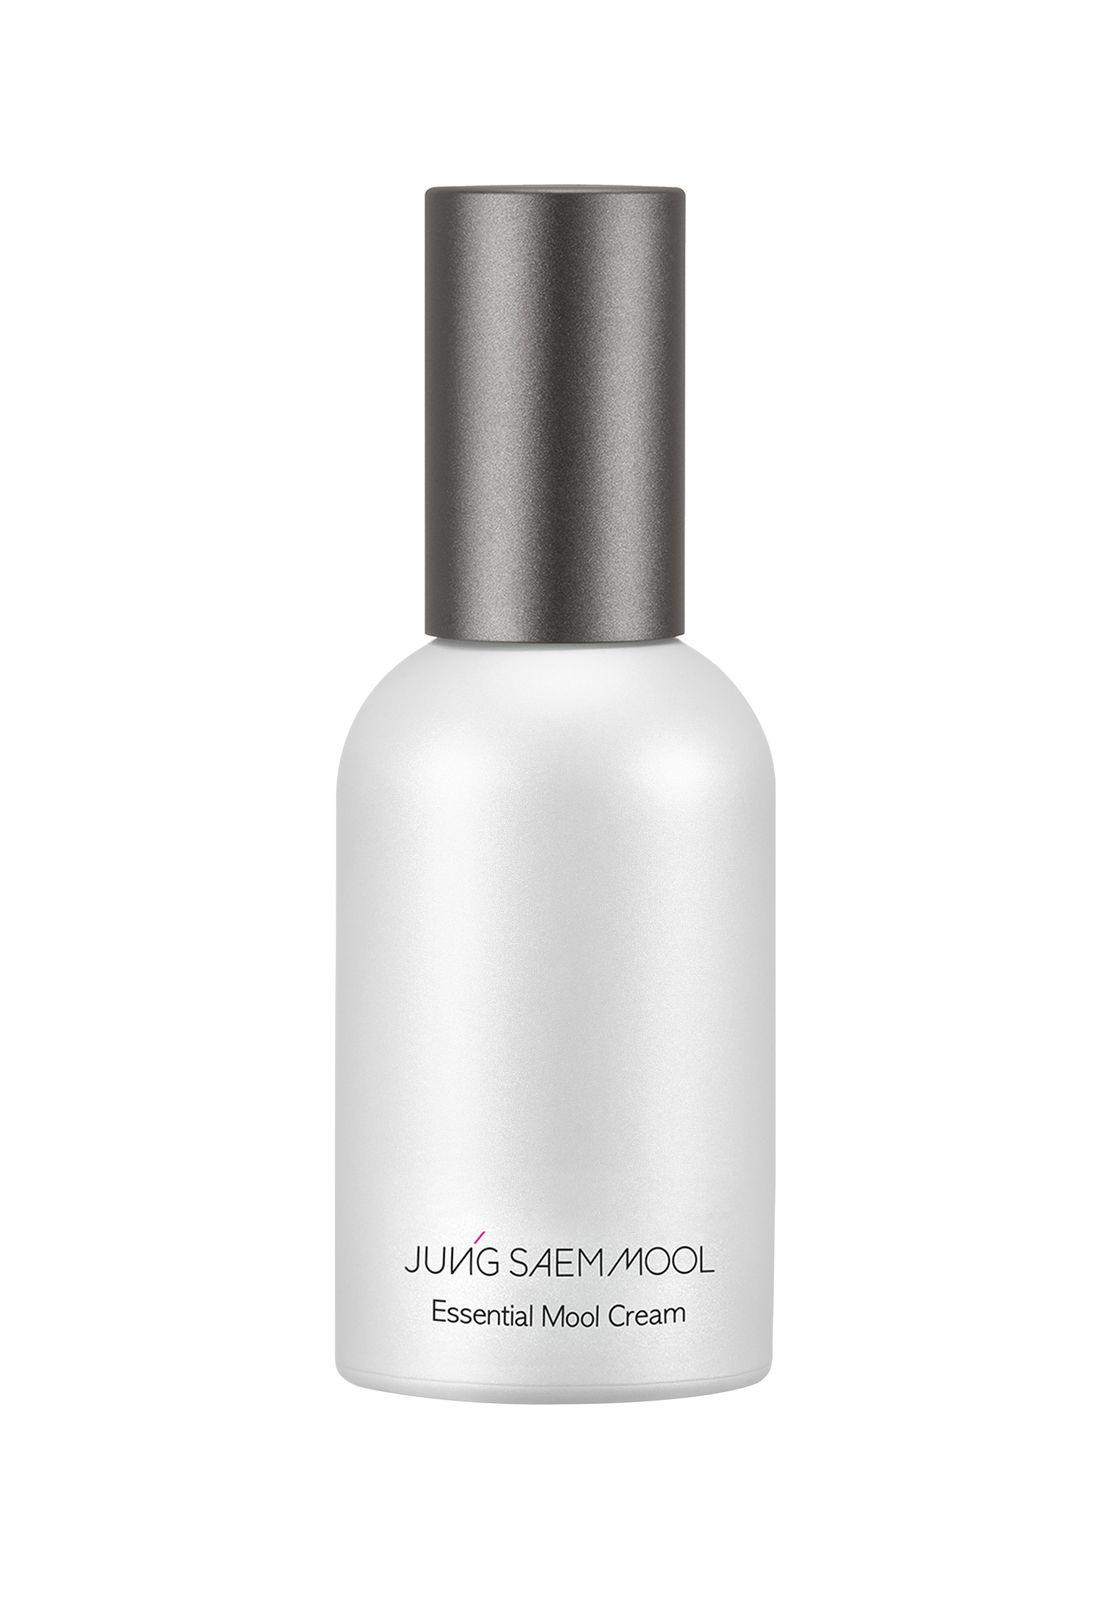 Mool cream Jung Seam Mool